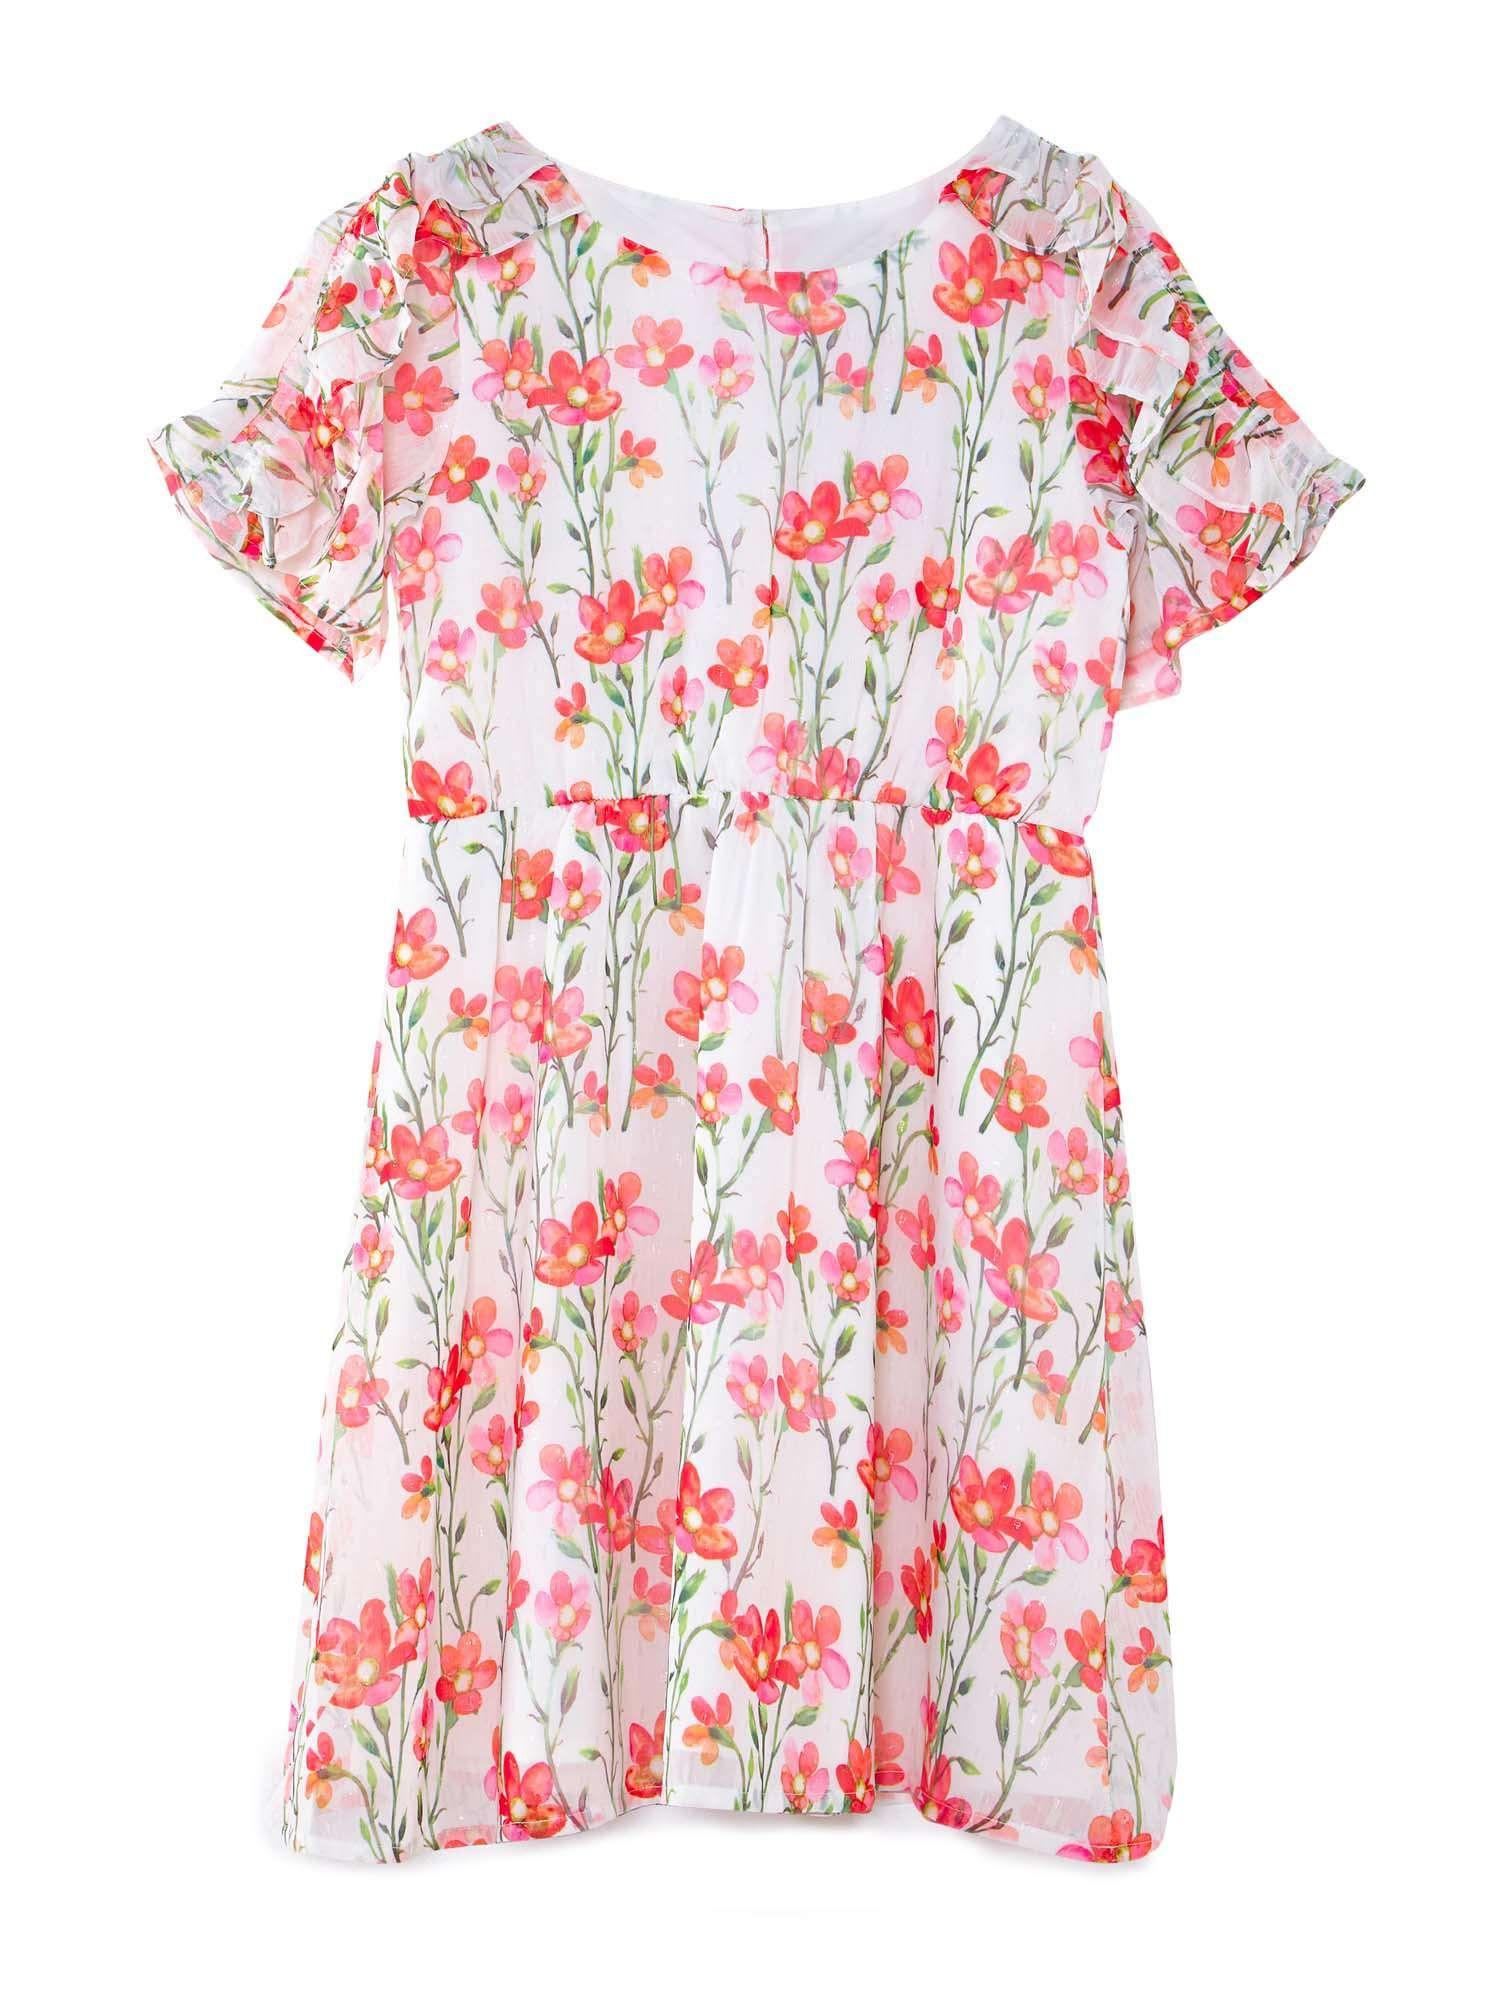 bfc5e21c Yumi Girls Girls Floral Kimono Dress - House of Fraser | aaradhya ...